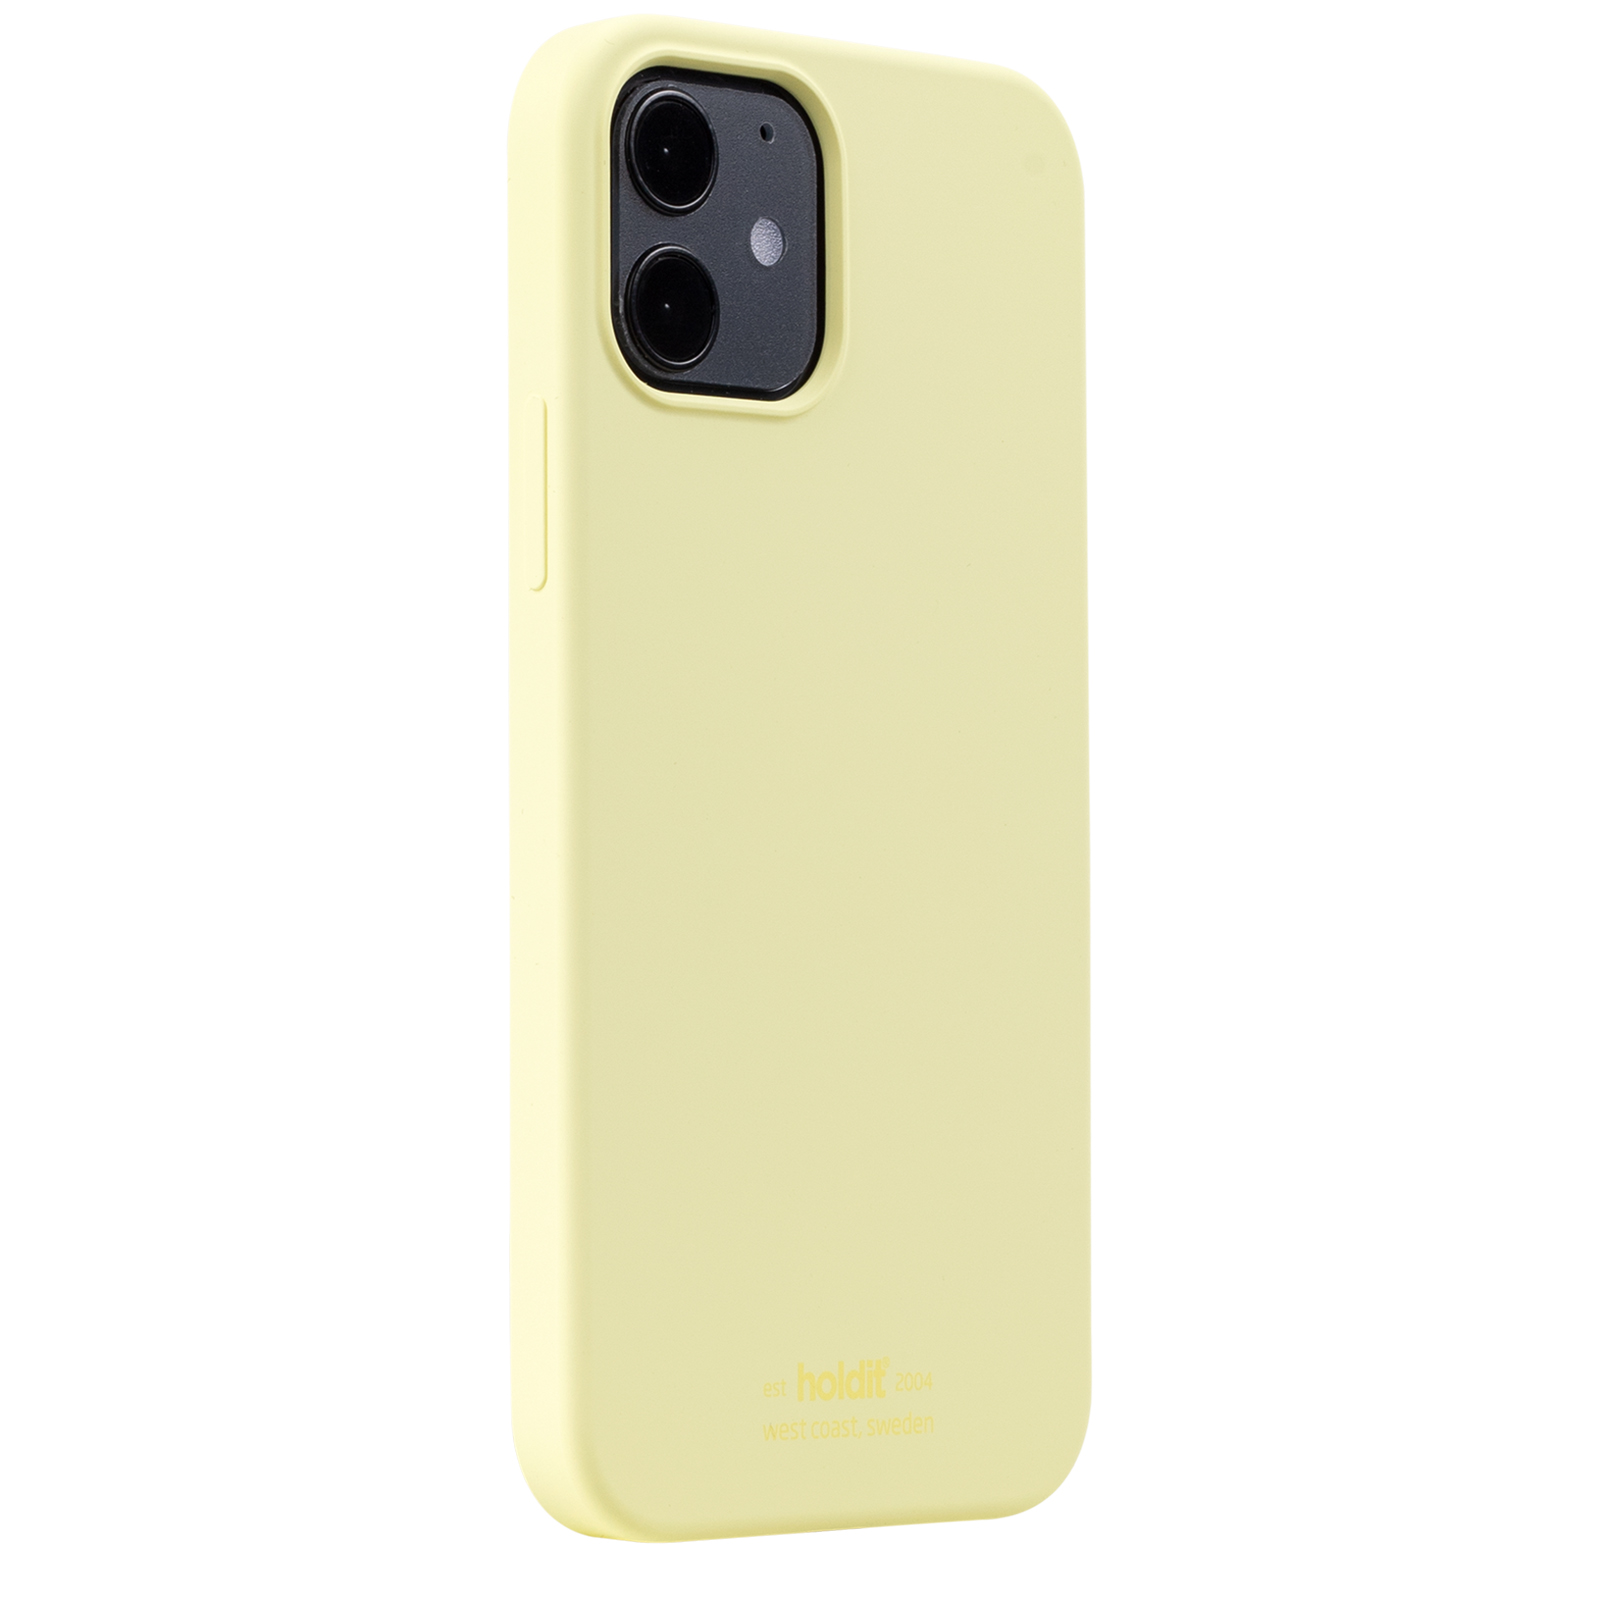 Holdit Mobilcover iPhone 12/12 Pro, lemon